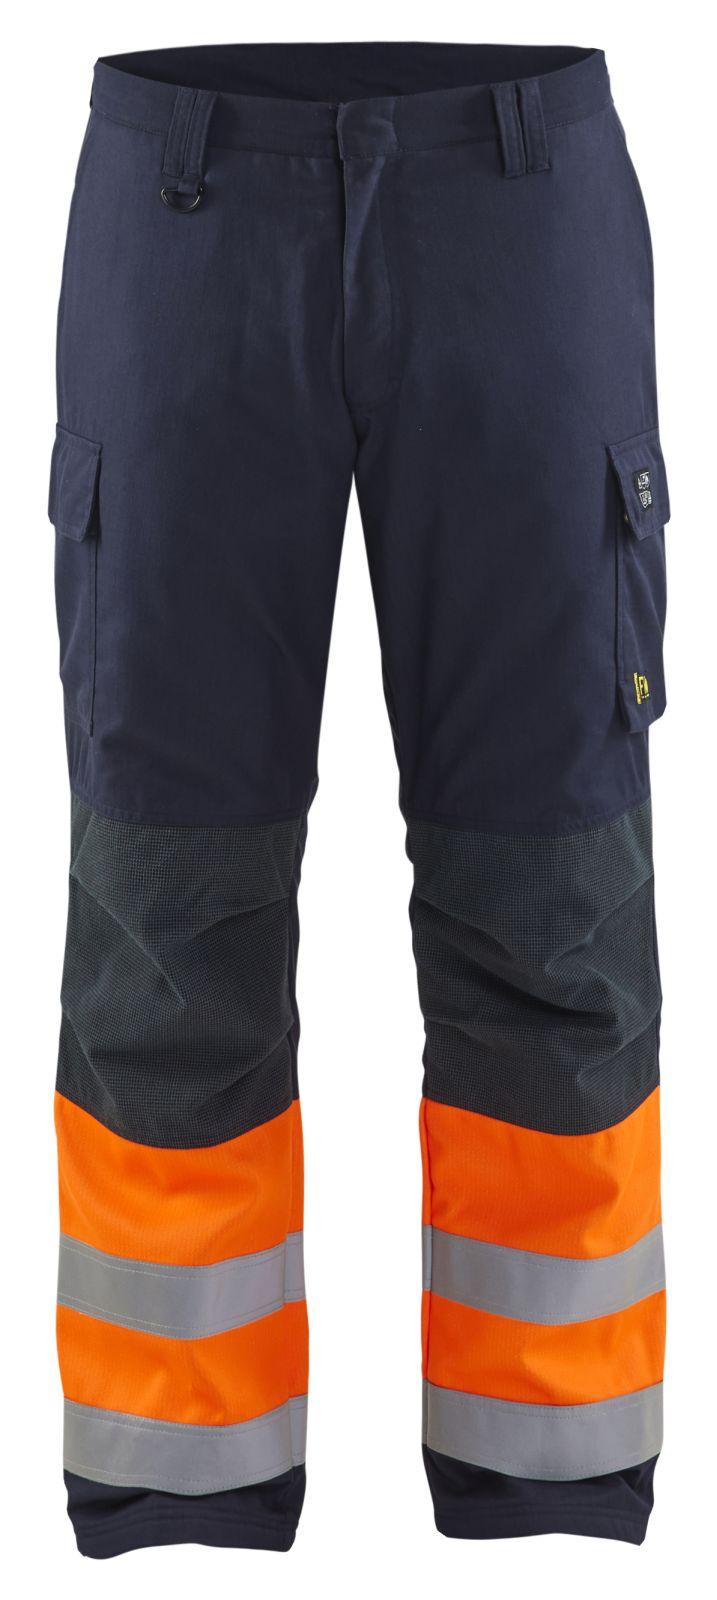 Blaklader Broeken 18691513 Multinorm marineblauw-oranje(8953)